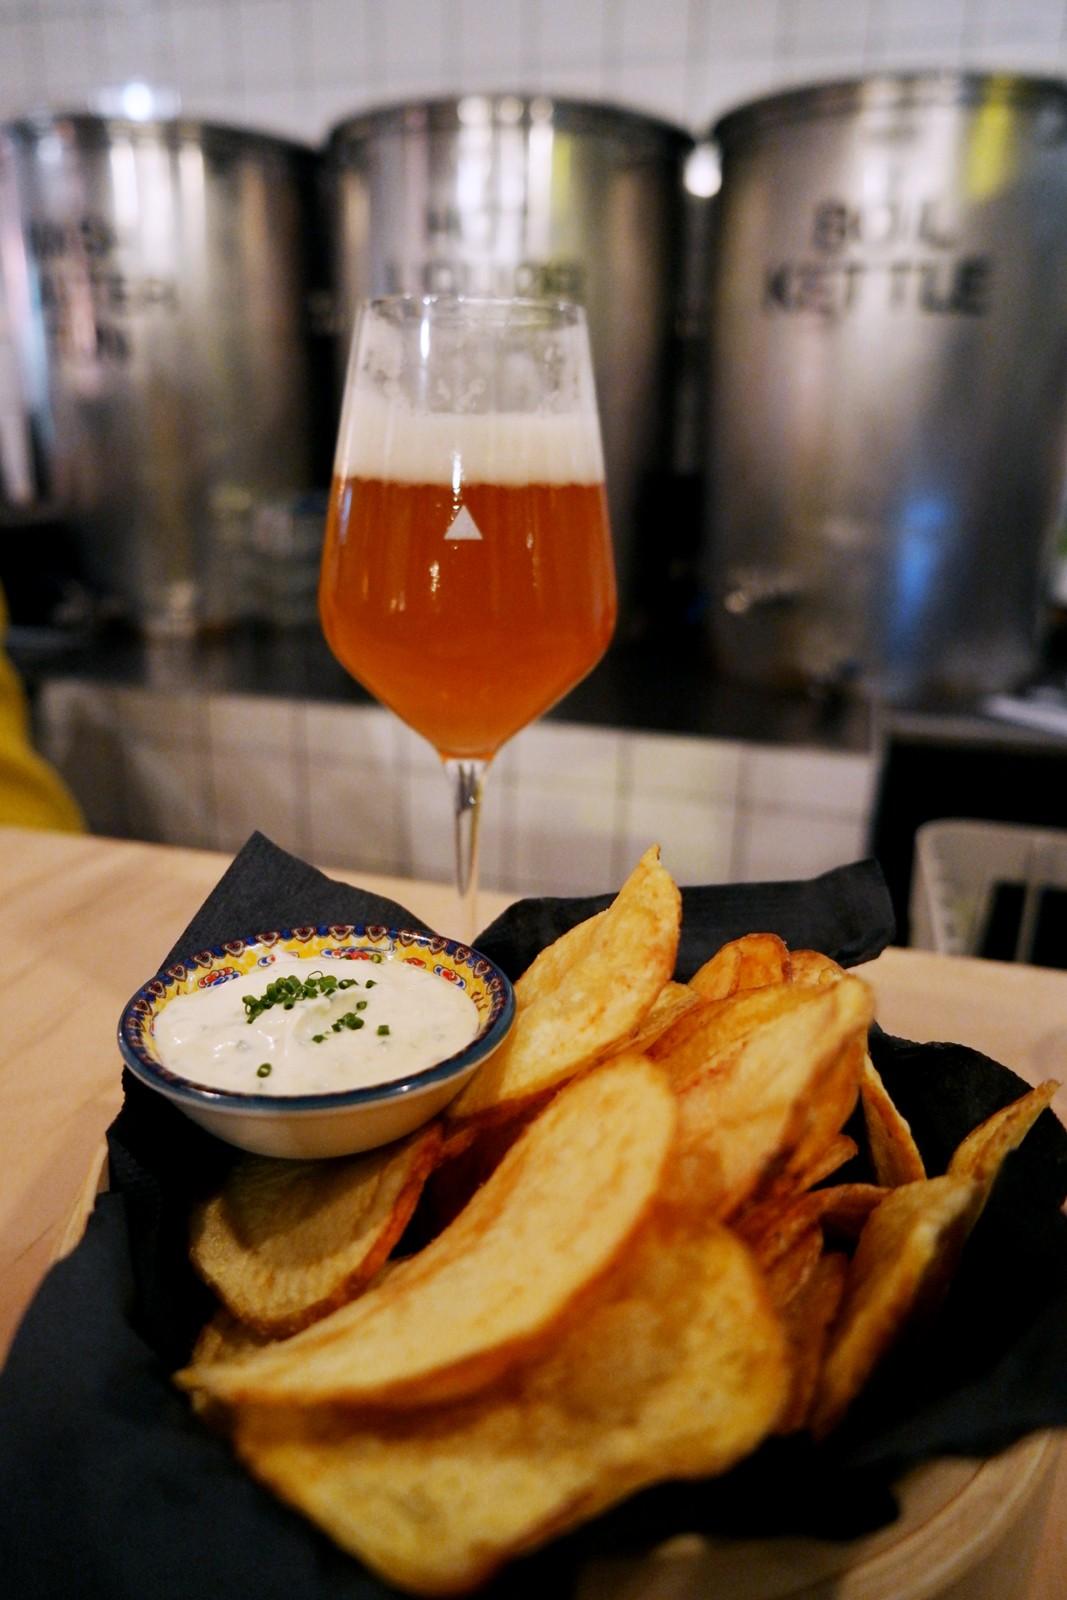 Le triangle paris restaurant vivifiant microbrasserie - Restaurant viroflay le verre y table ...